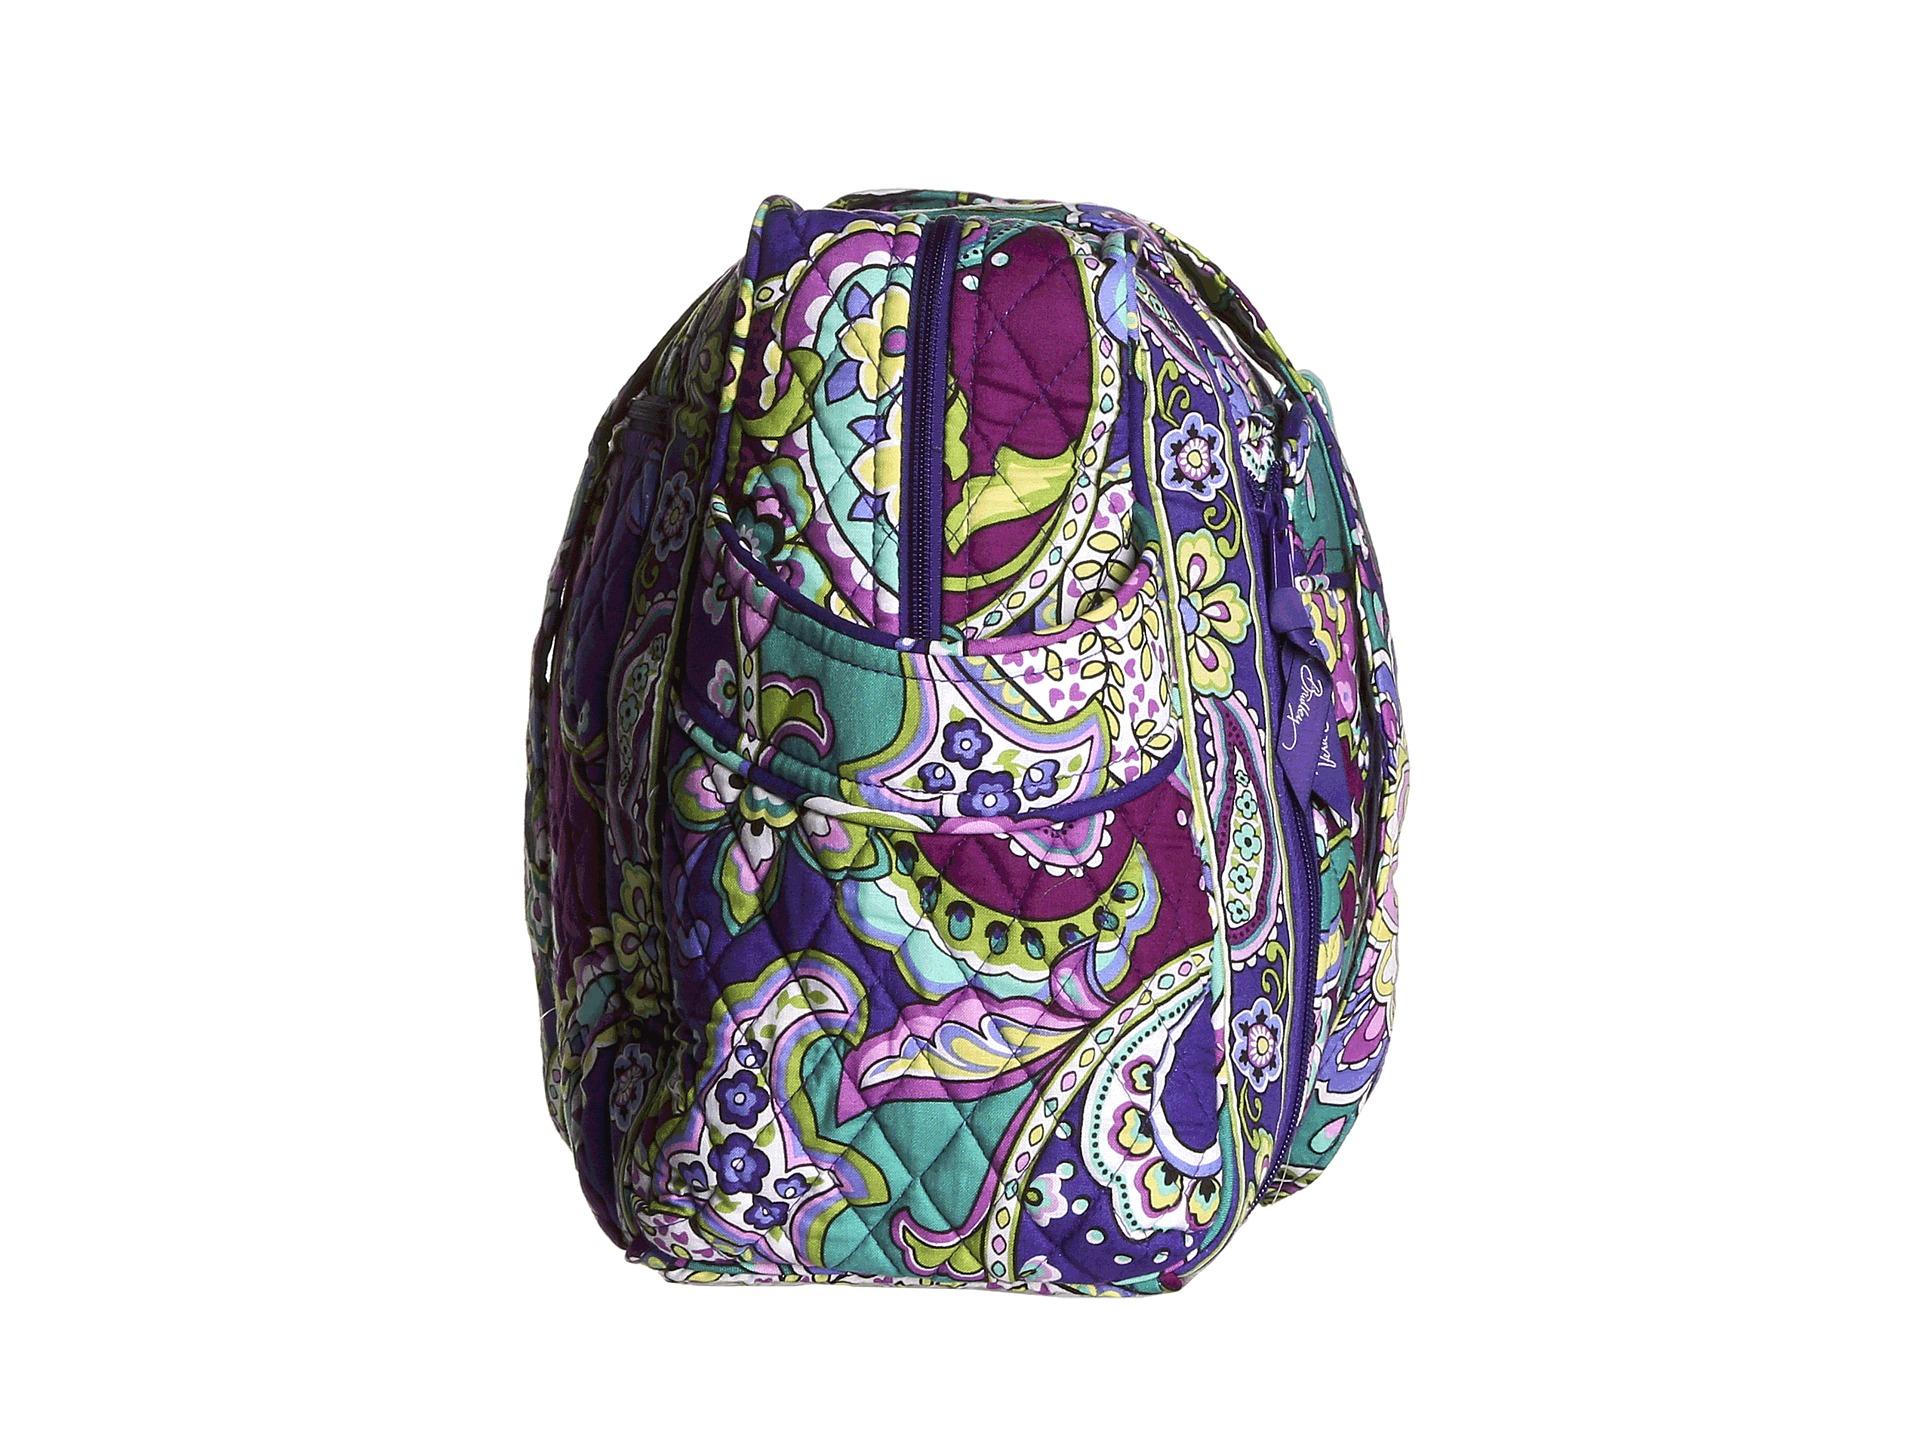 vera bradley handbags vera bradley outlet diaper bags. Black Bedroom Furniture Sets. Home Design Ideas